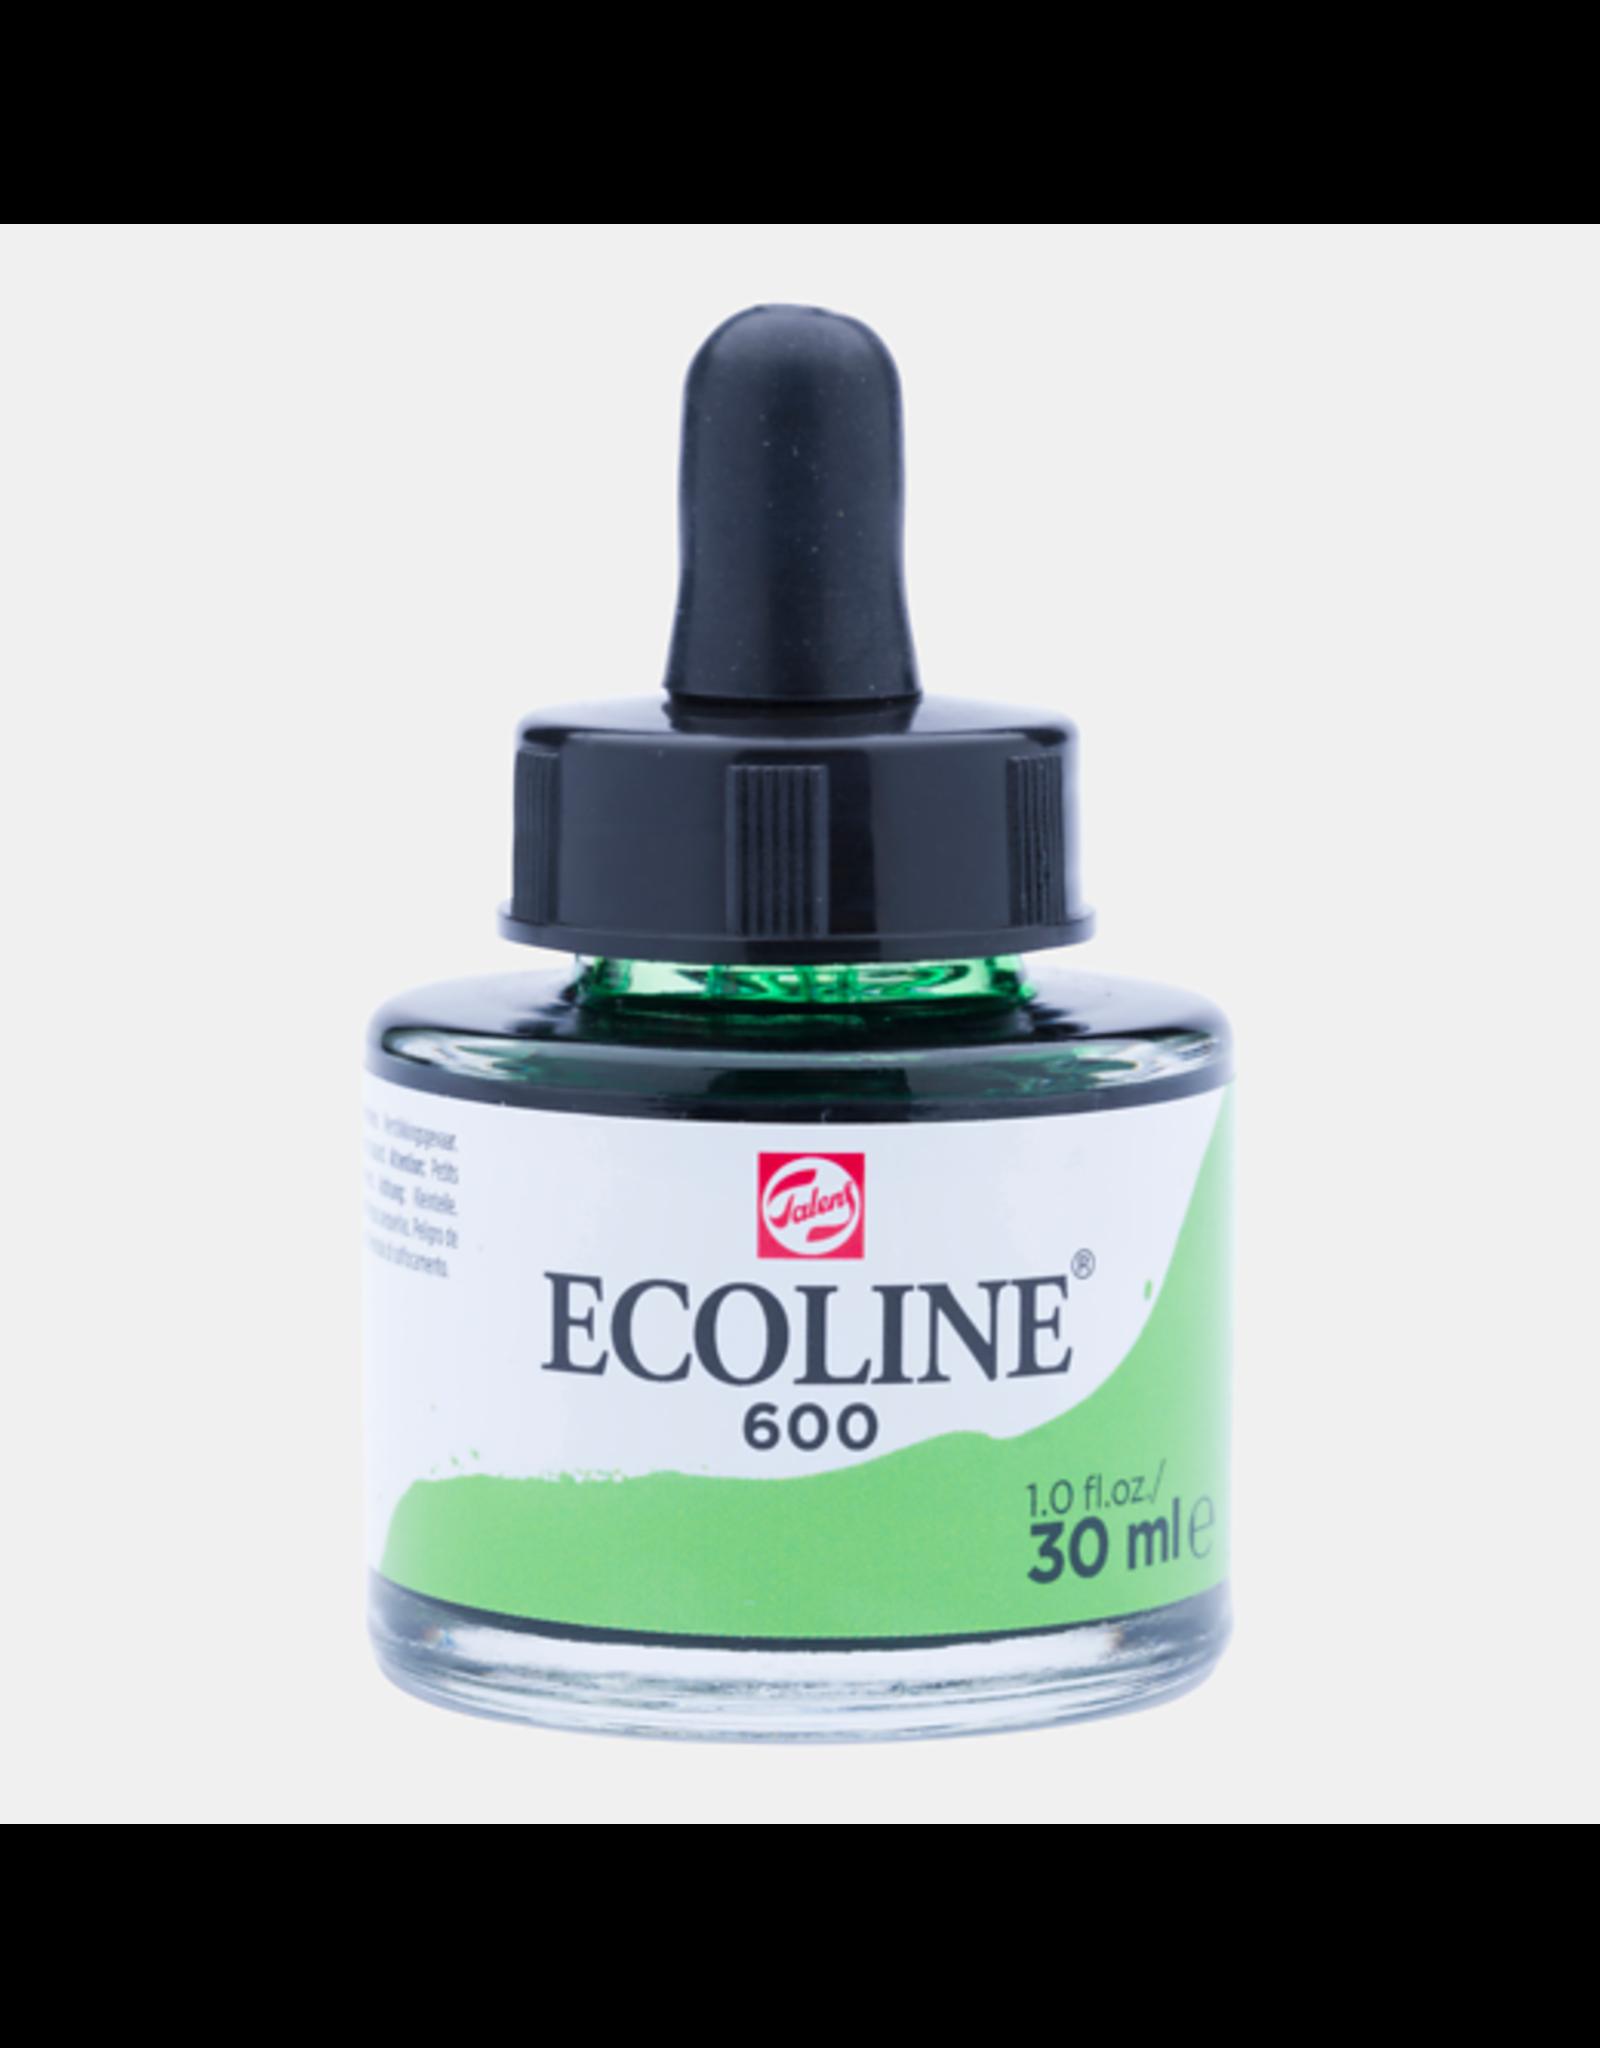 Talens Ecoline 30 ML. Groen